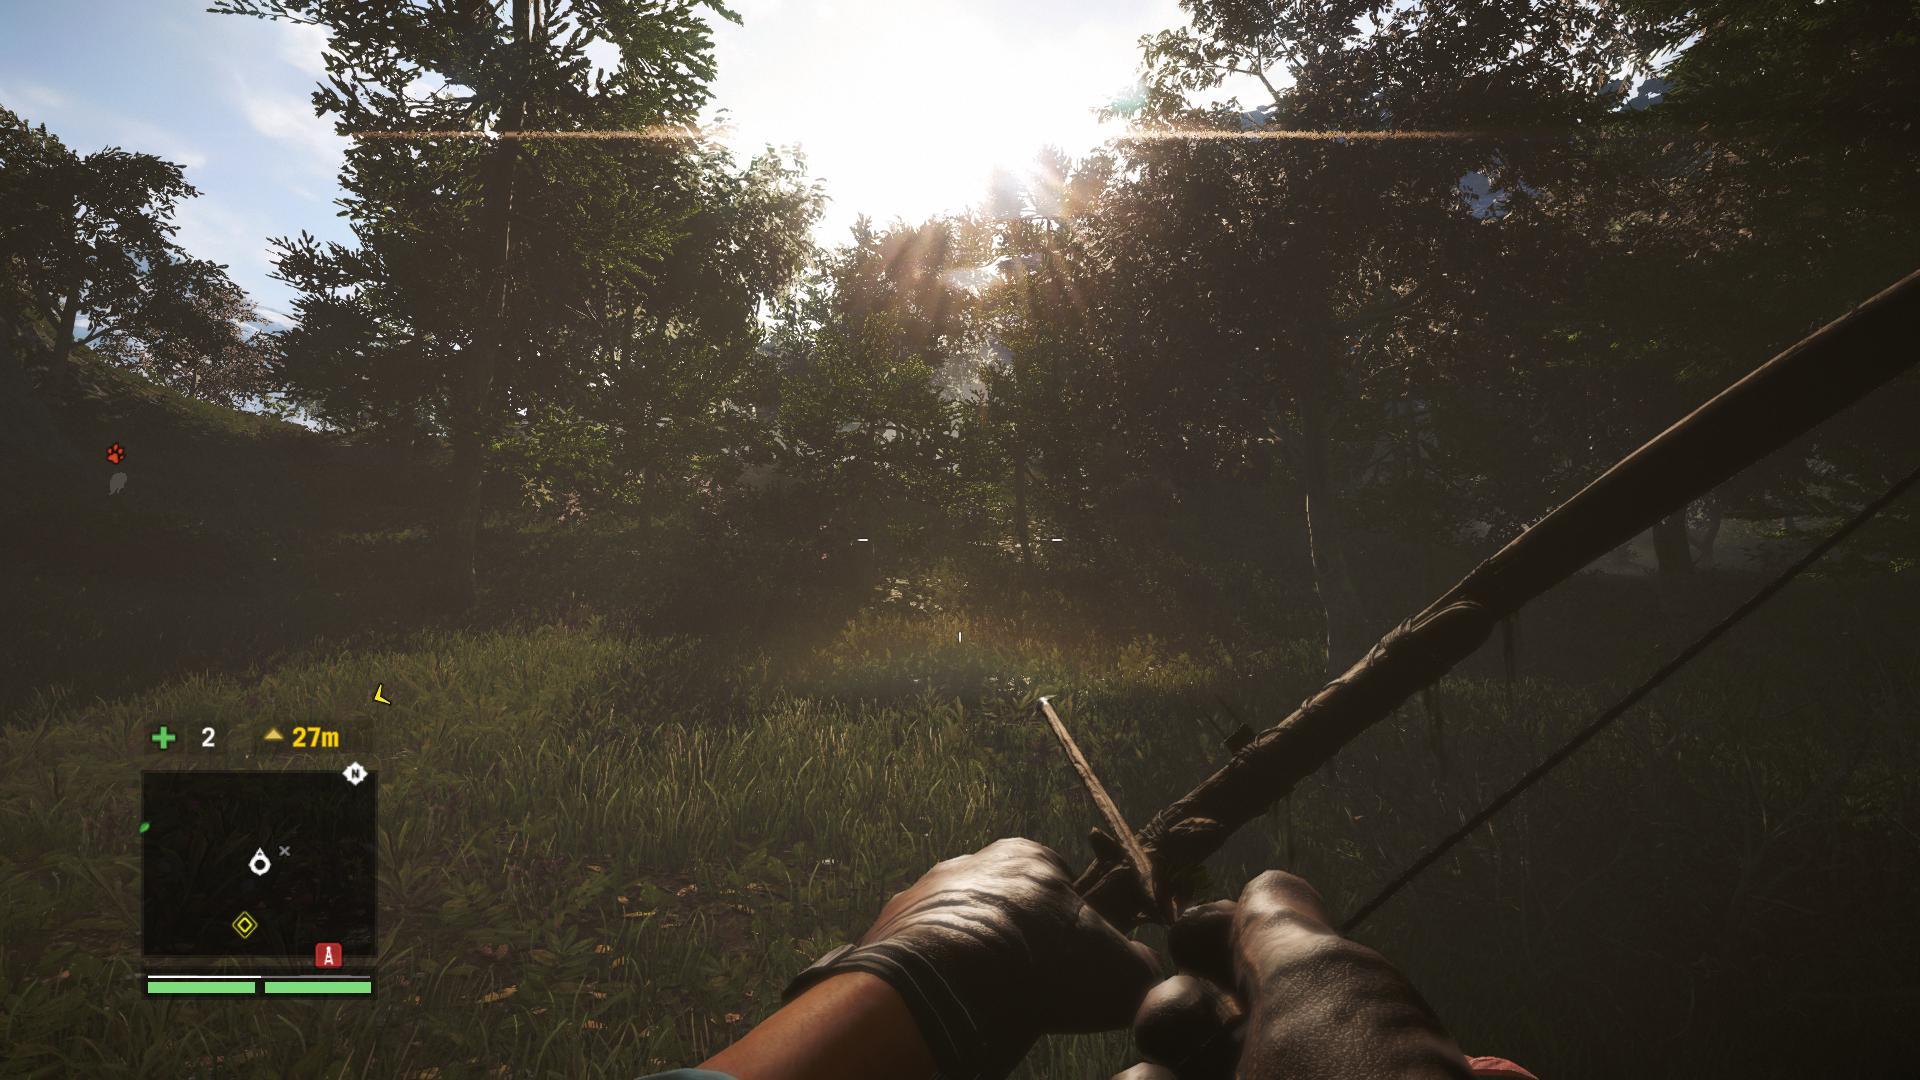 Full Far Cry 4 Map Reveals The Regions Of Kyrat: Far Cry 4 PC Port Impressions